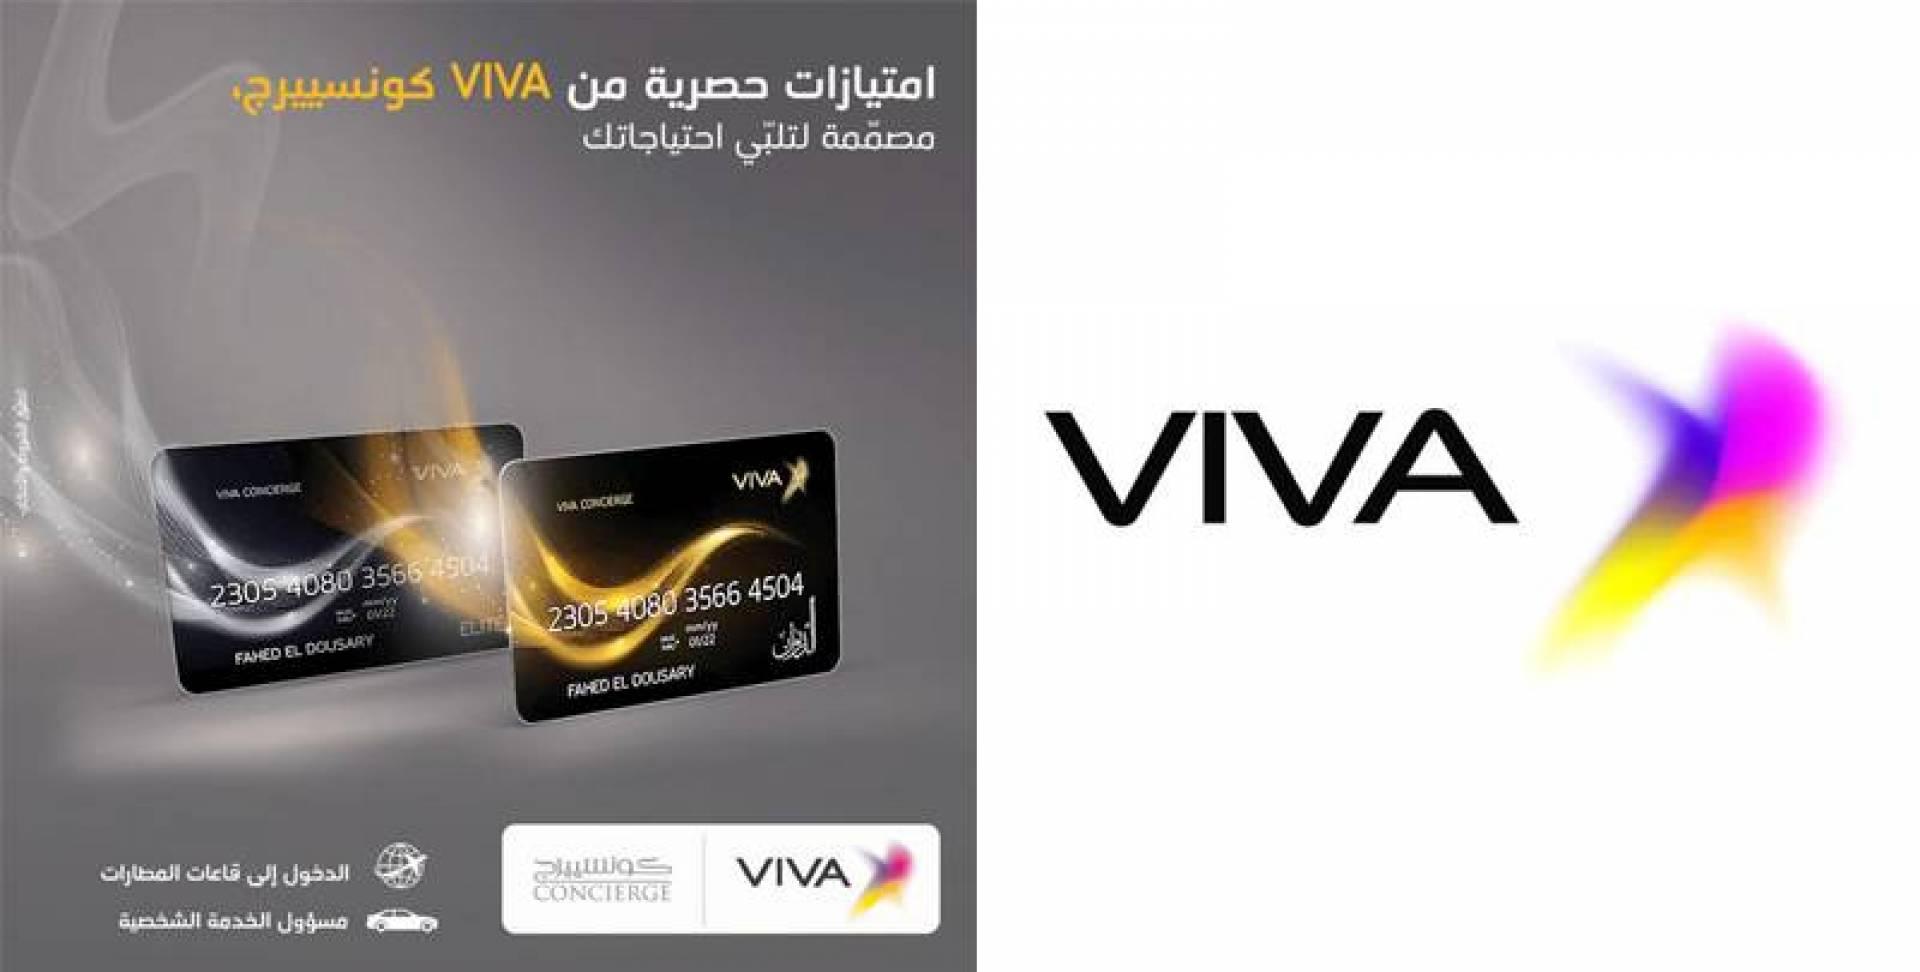 VIVA تطلق خدمة كونسييرج